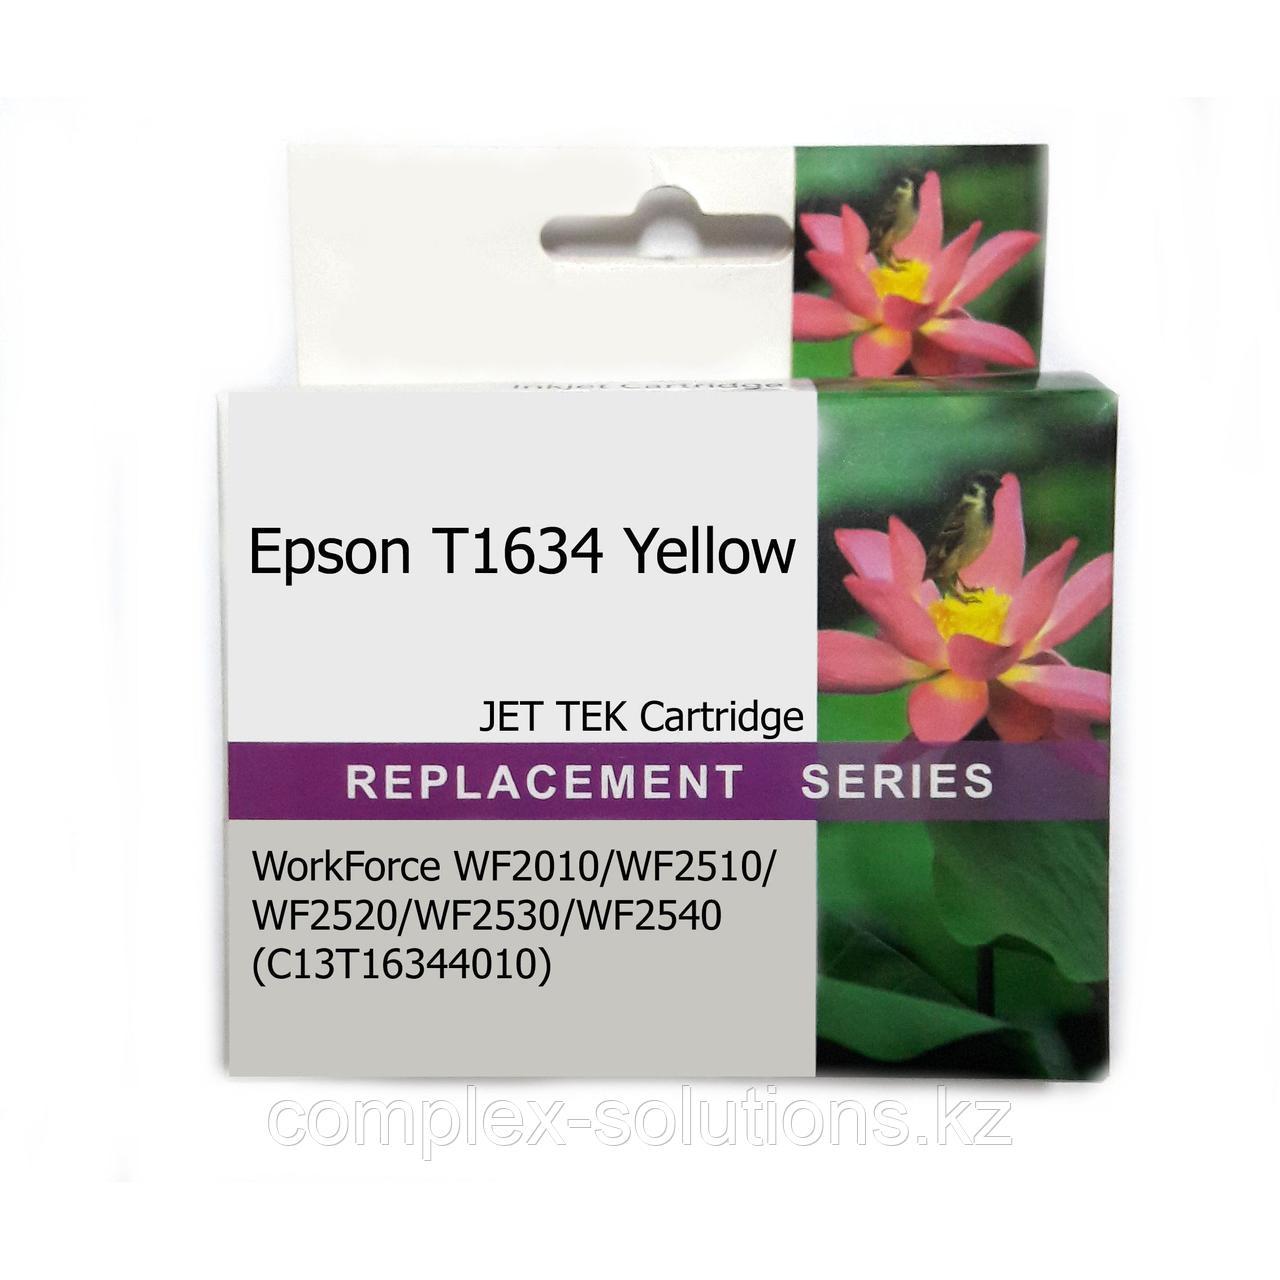 Картридж EPSON T1634 Yellow JET TEK | [качественный дубликат]